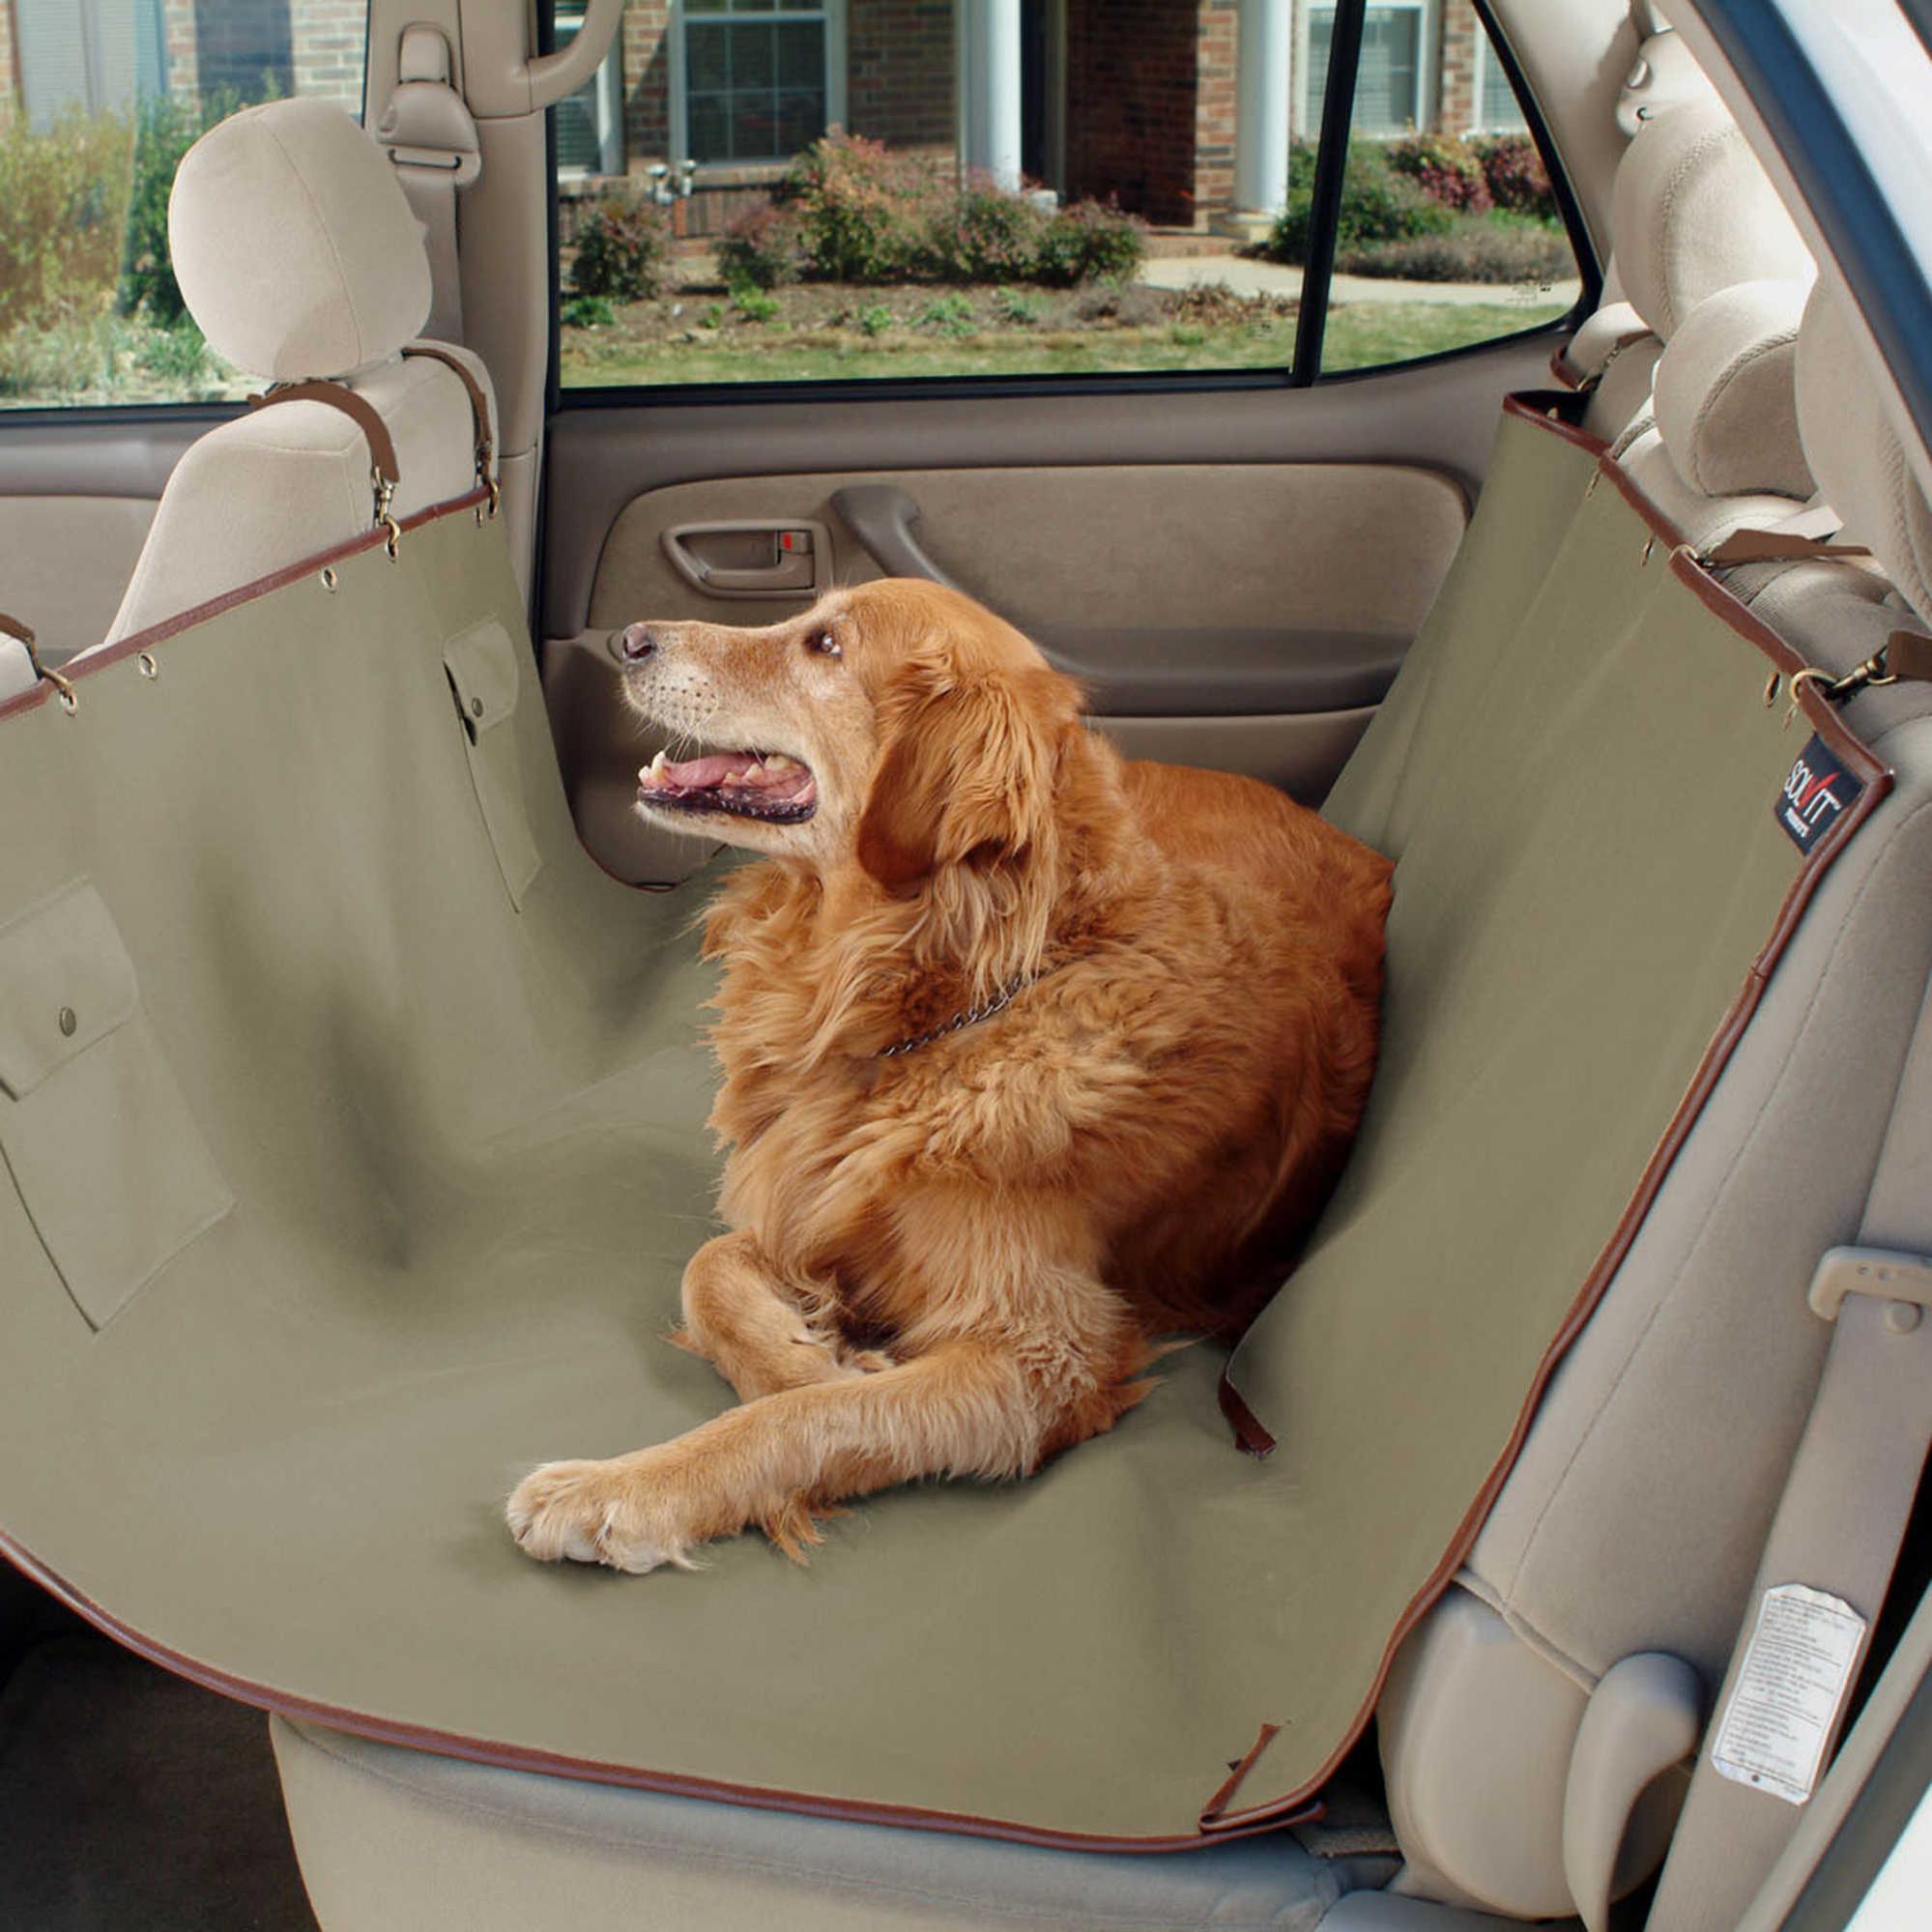 doghammock hammocks dogbed dog personalized yorkie cat cathammock funnypet pin hammock catbed